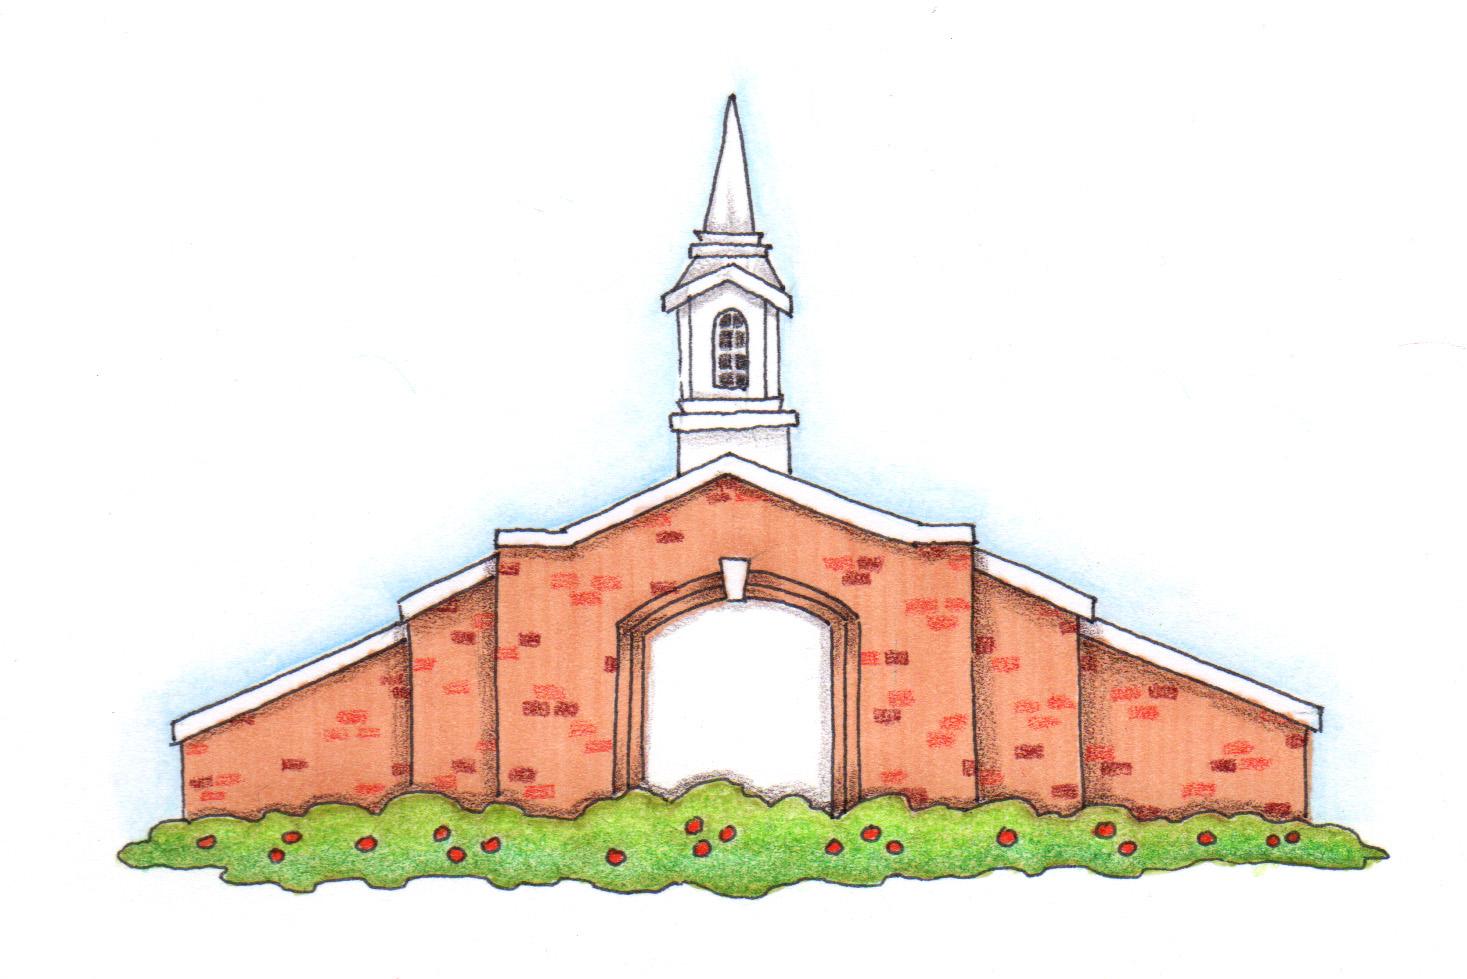 Steeple clipart kid BuildingKid Pin helps Activities church: